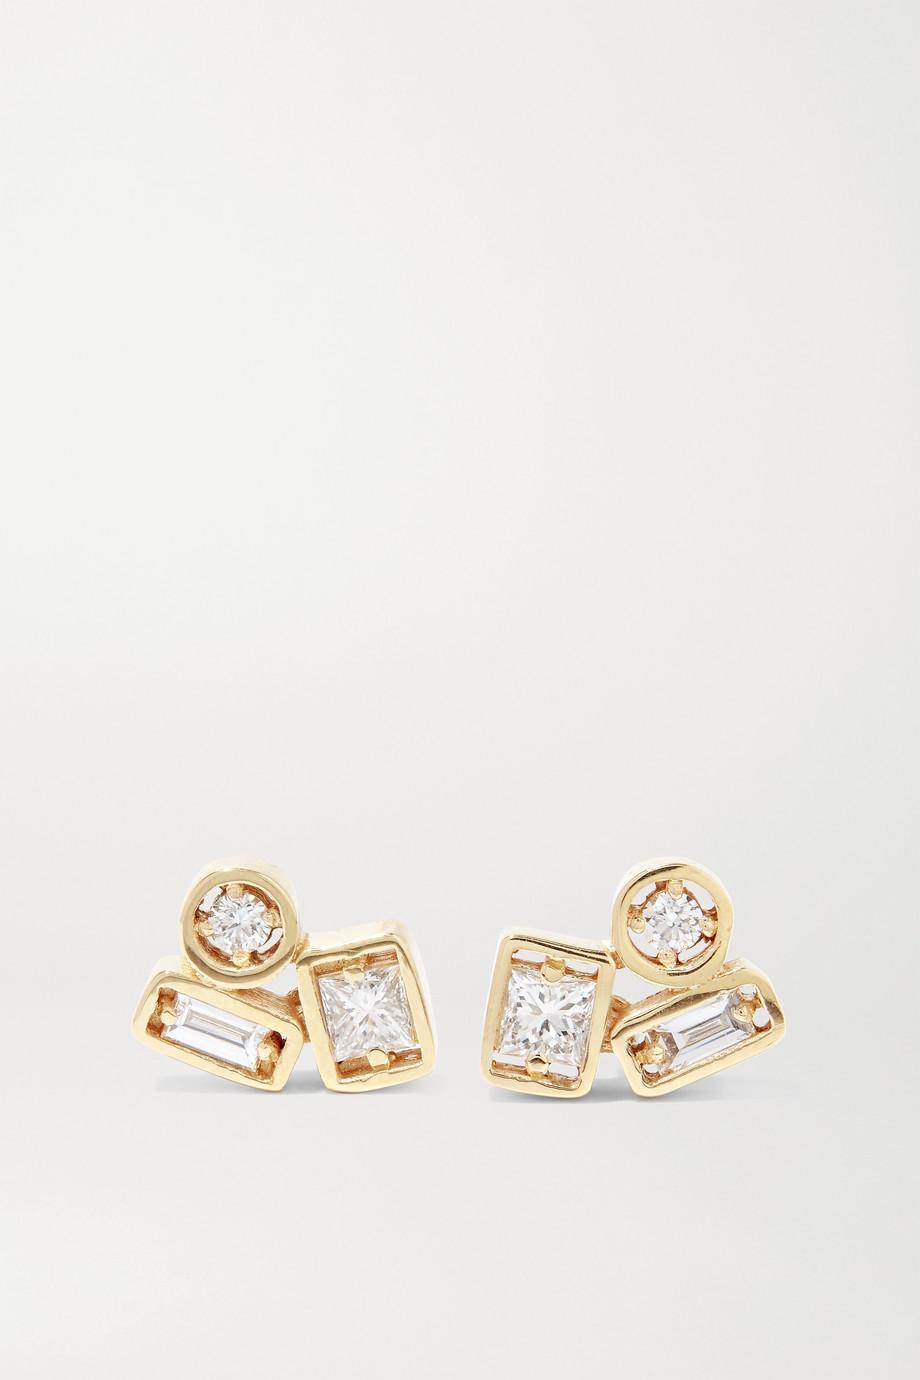 Suzanne Kalan Ohrringe aus 18Karat Gold mit Diamanten